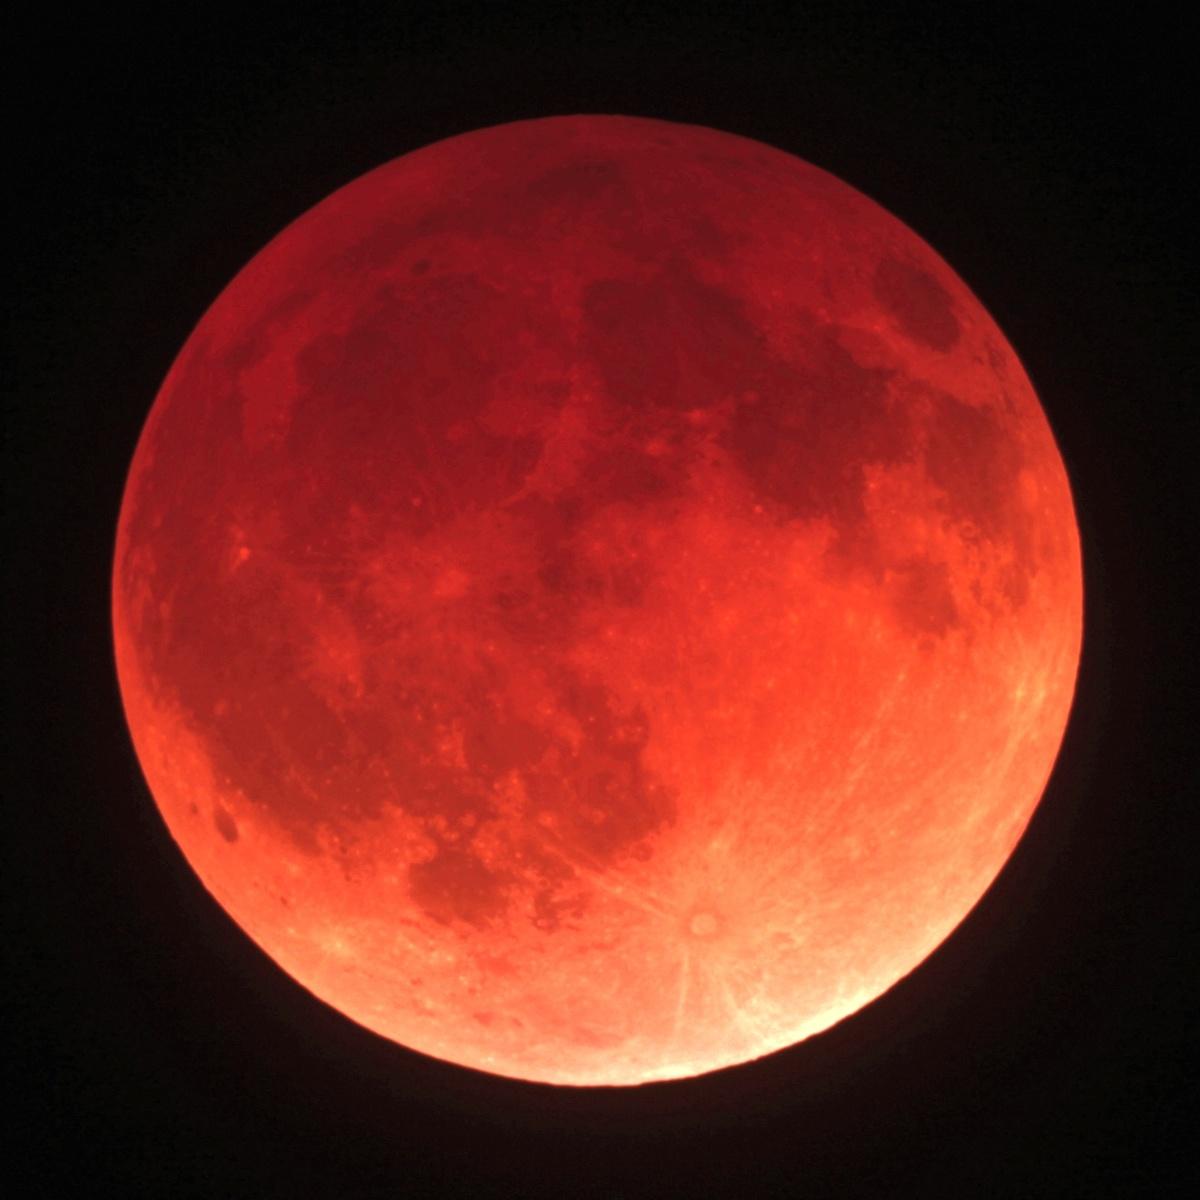 Este 27 28 de septiembre se producir un eclipse total for Que fase lunar hay hoy